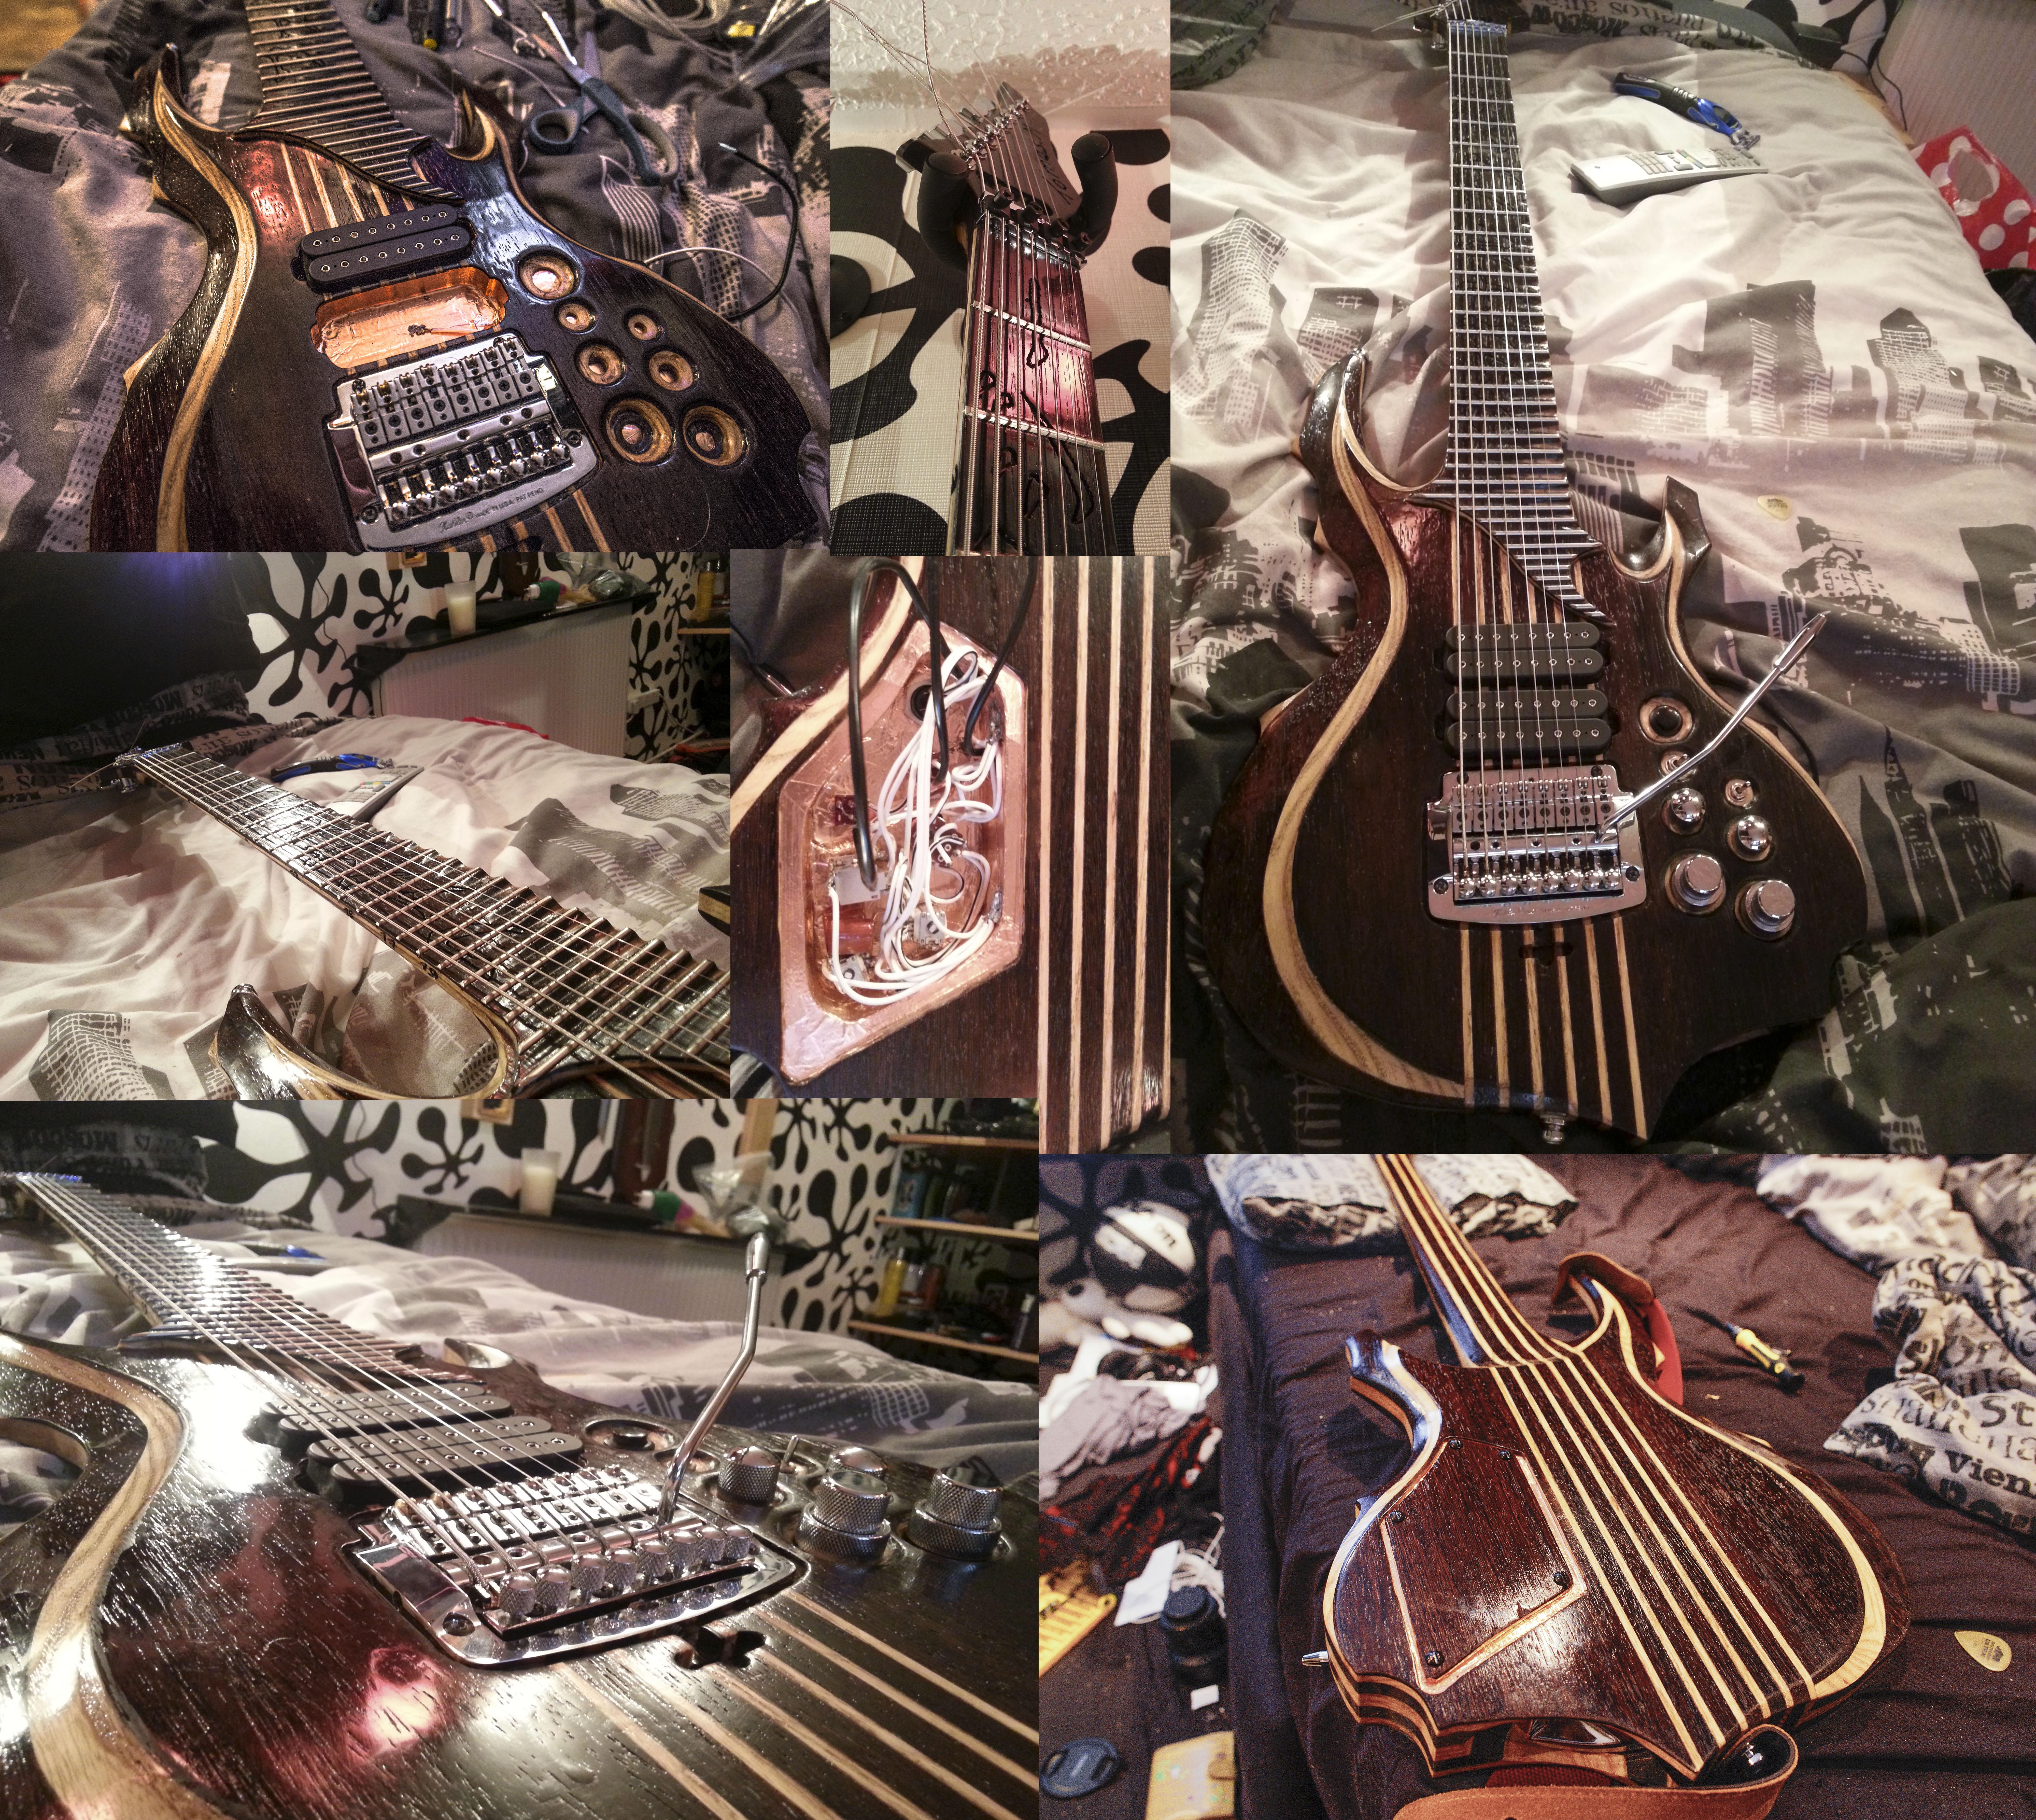 Tomas Mascinskas Signature 8 String Guitar by TMProjection